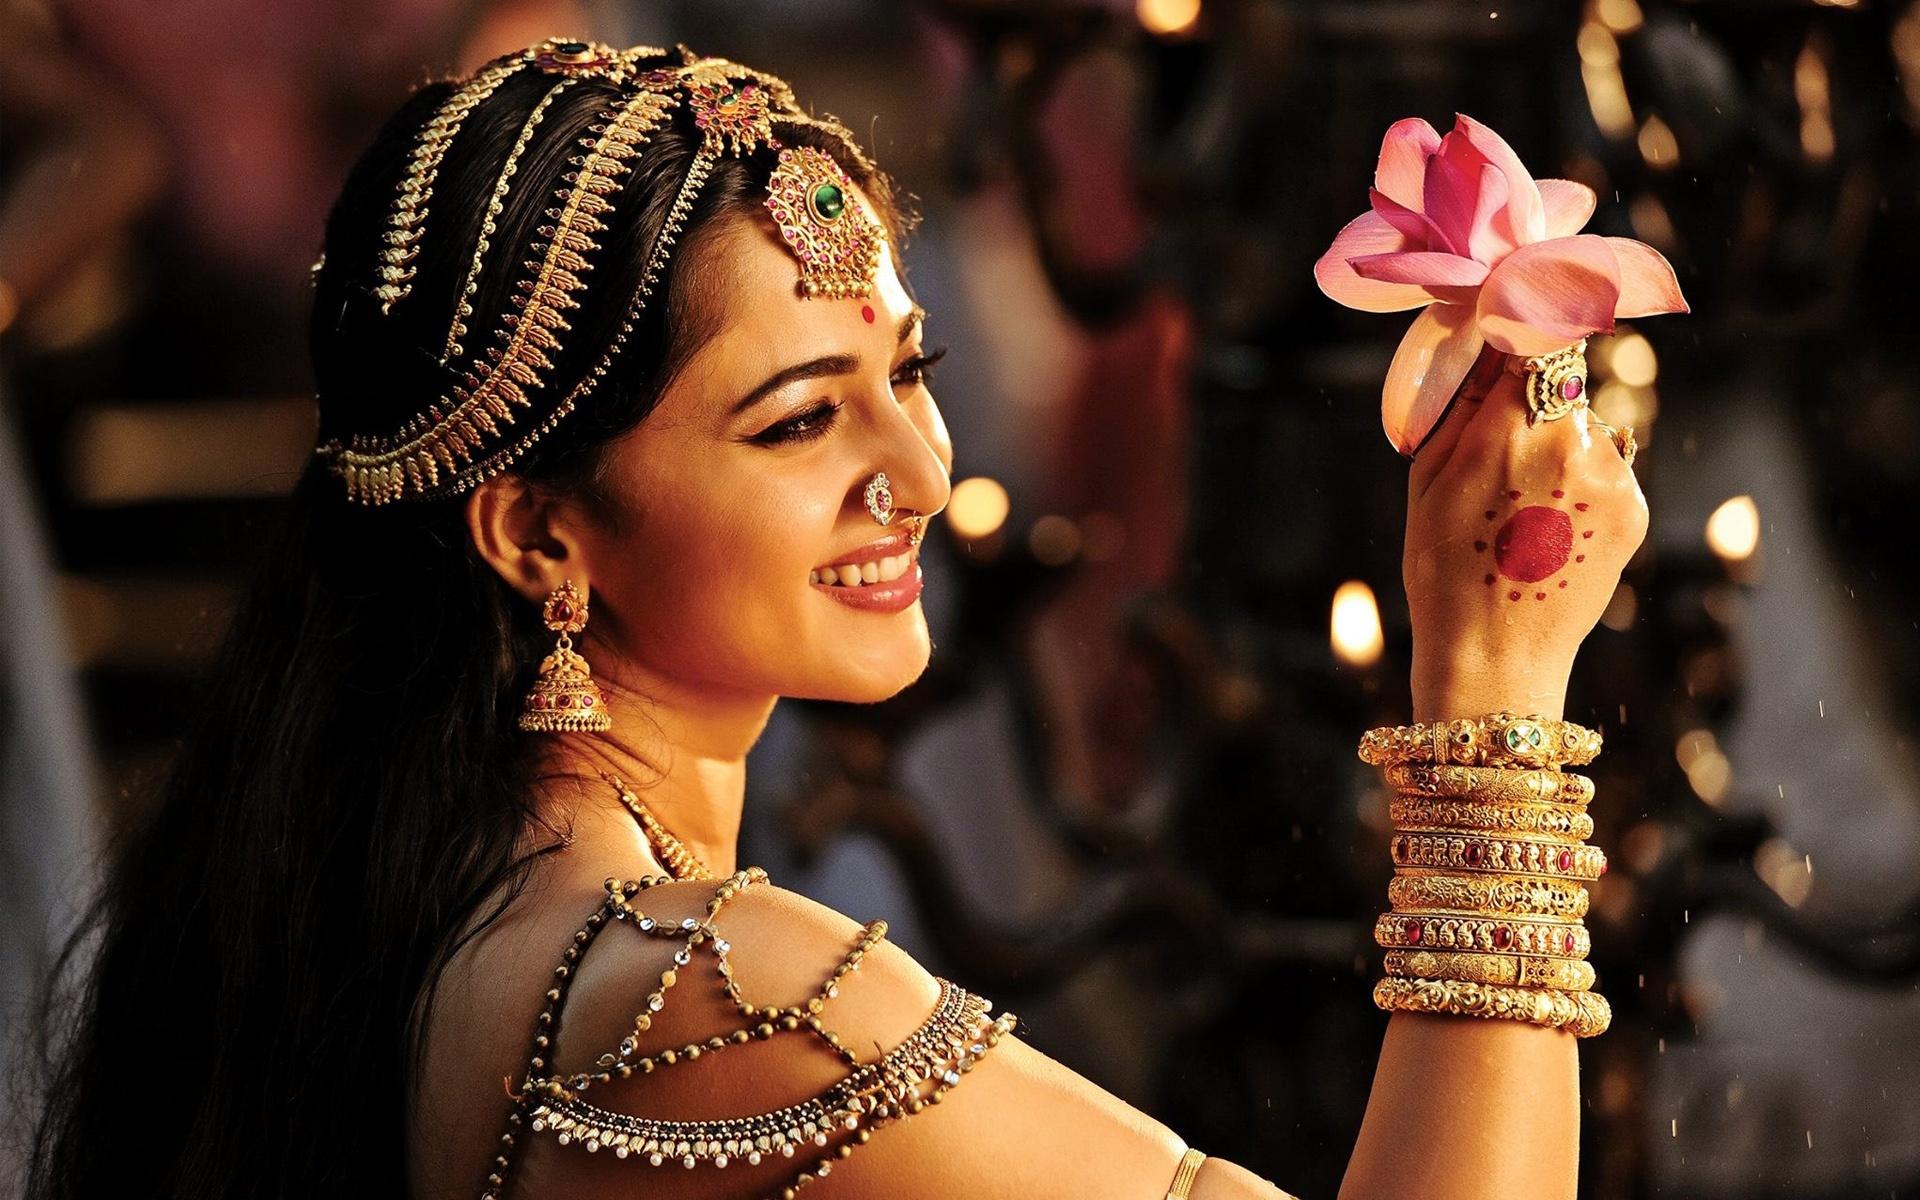 Rudramadevi full movie download 720p torrents by rieplatenper issuu.